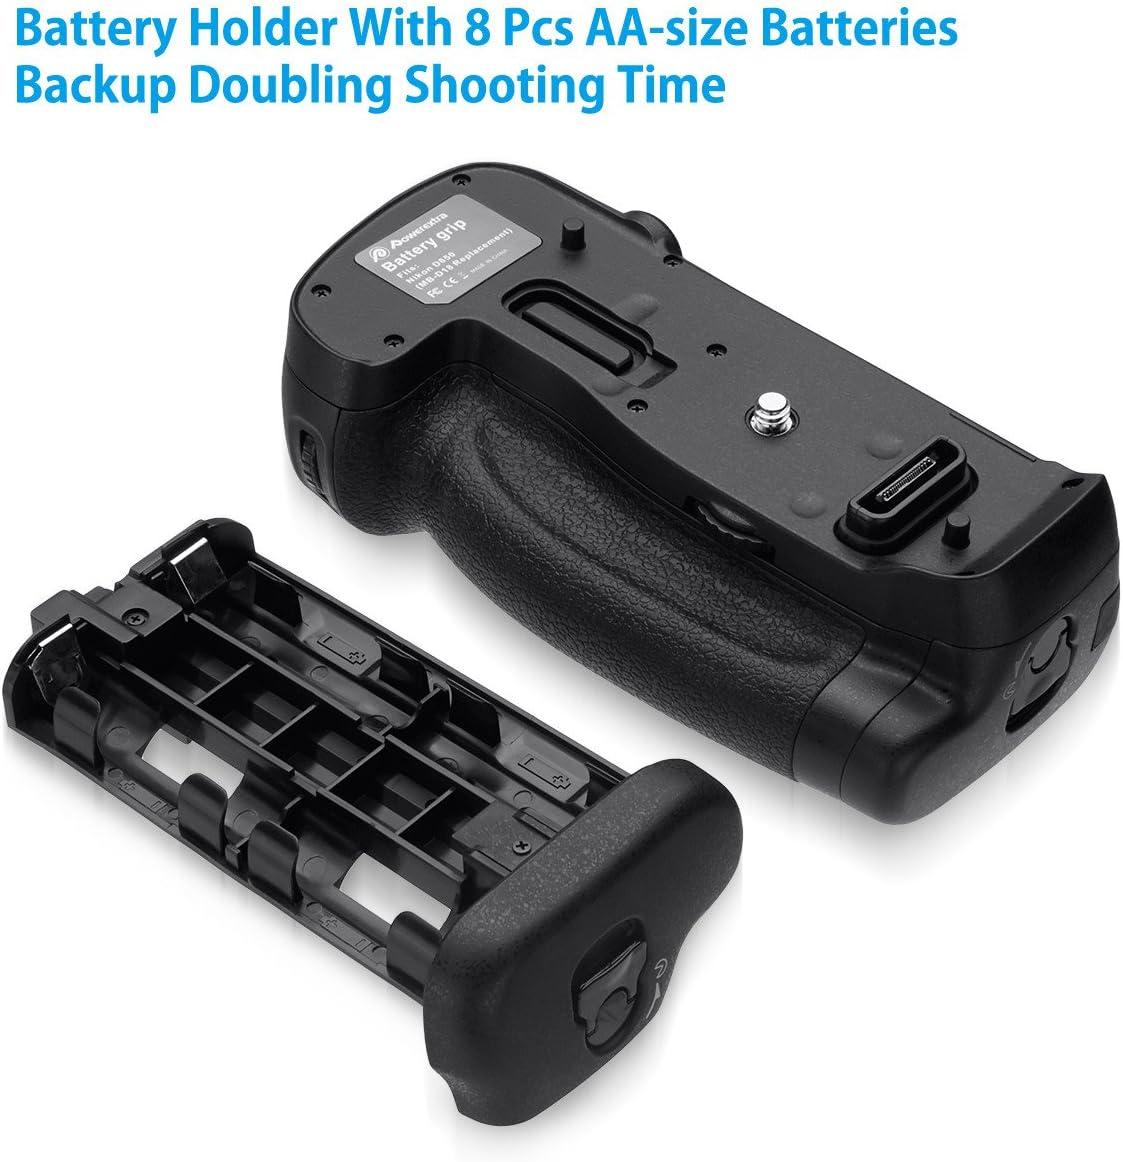 9FPS 7FPS Powerextra MB-D18 Battery Grip or EN-EL18 a//b Battery AA-Size Battery Holder Compatible with Nikon D850 Digital SLR Camera Work with EN-EL15 EN-EL15a //AA-Size Batteries